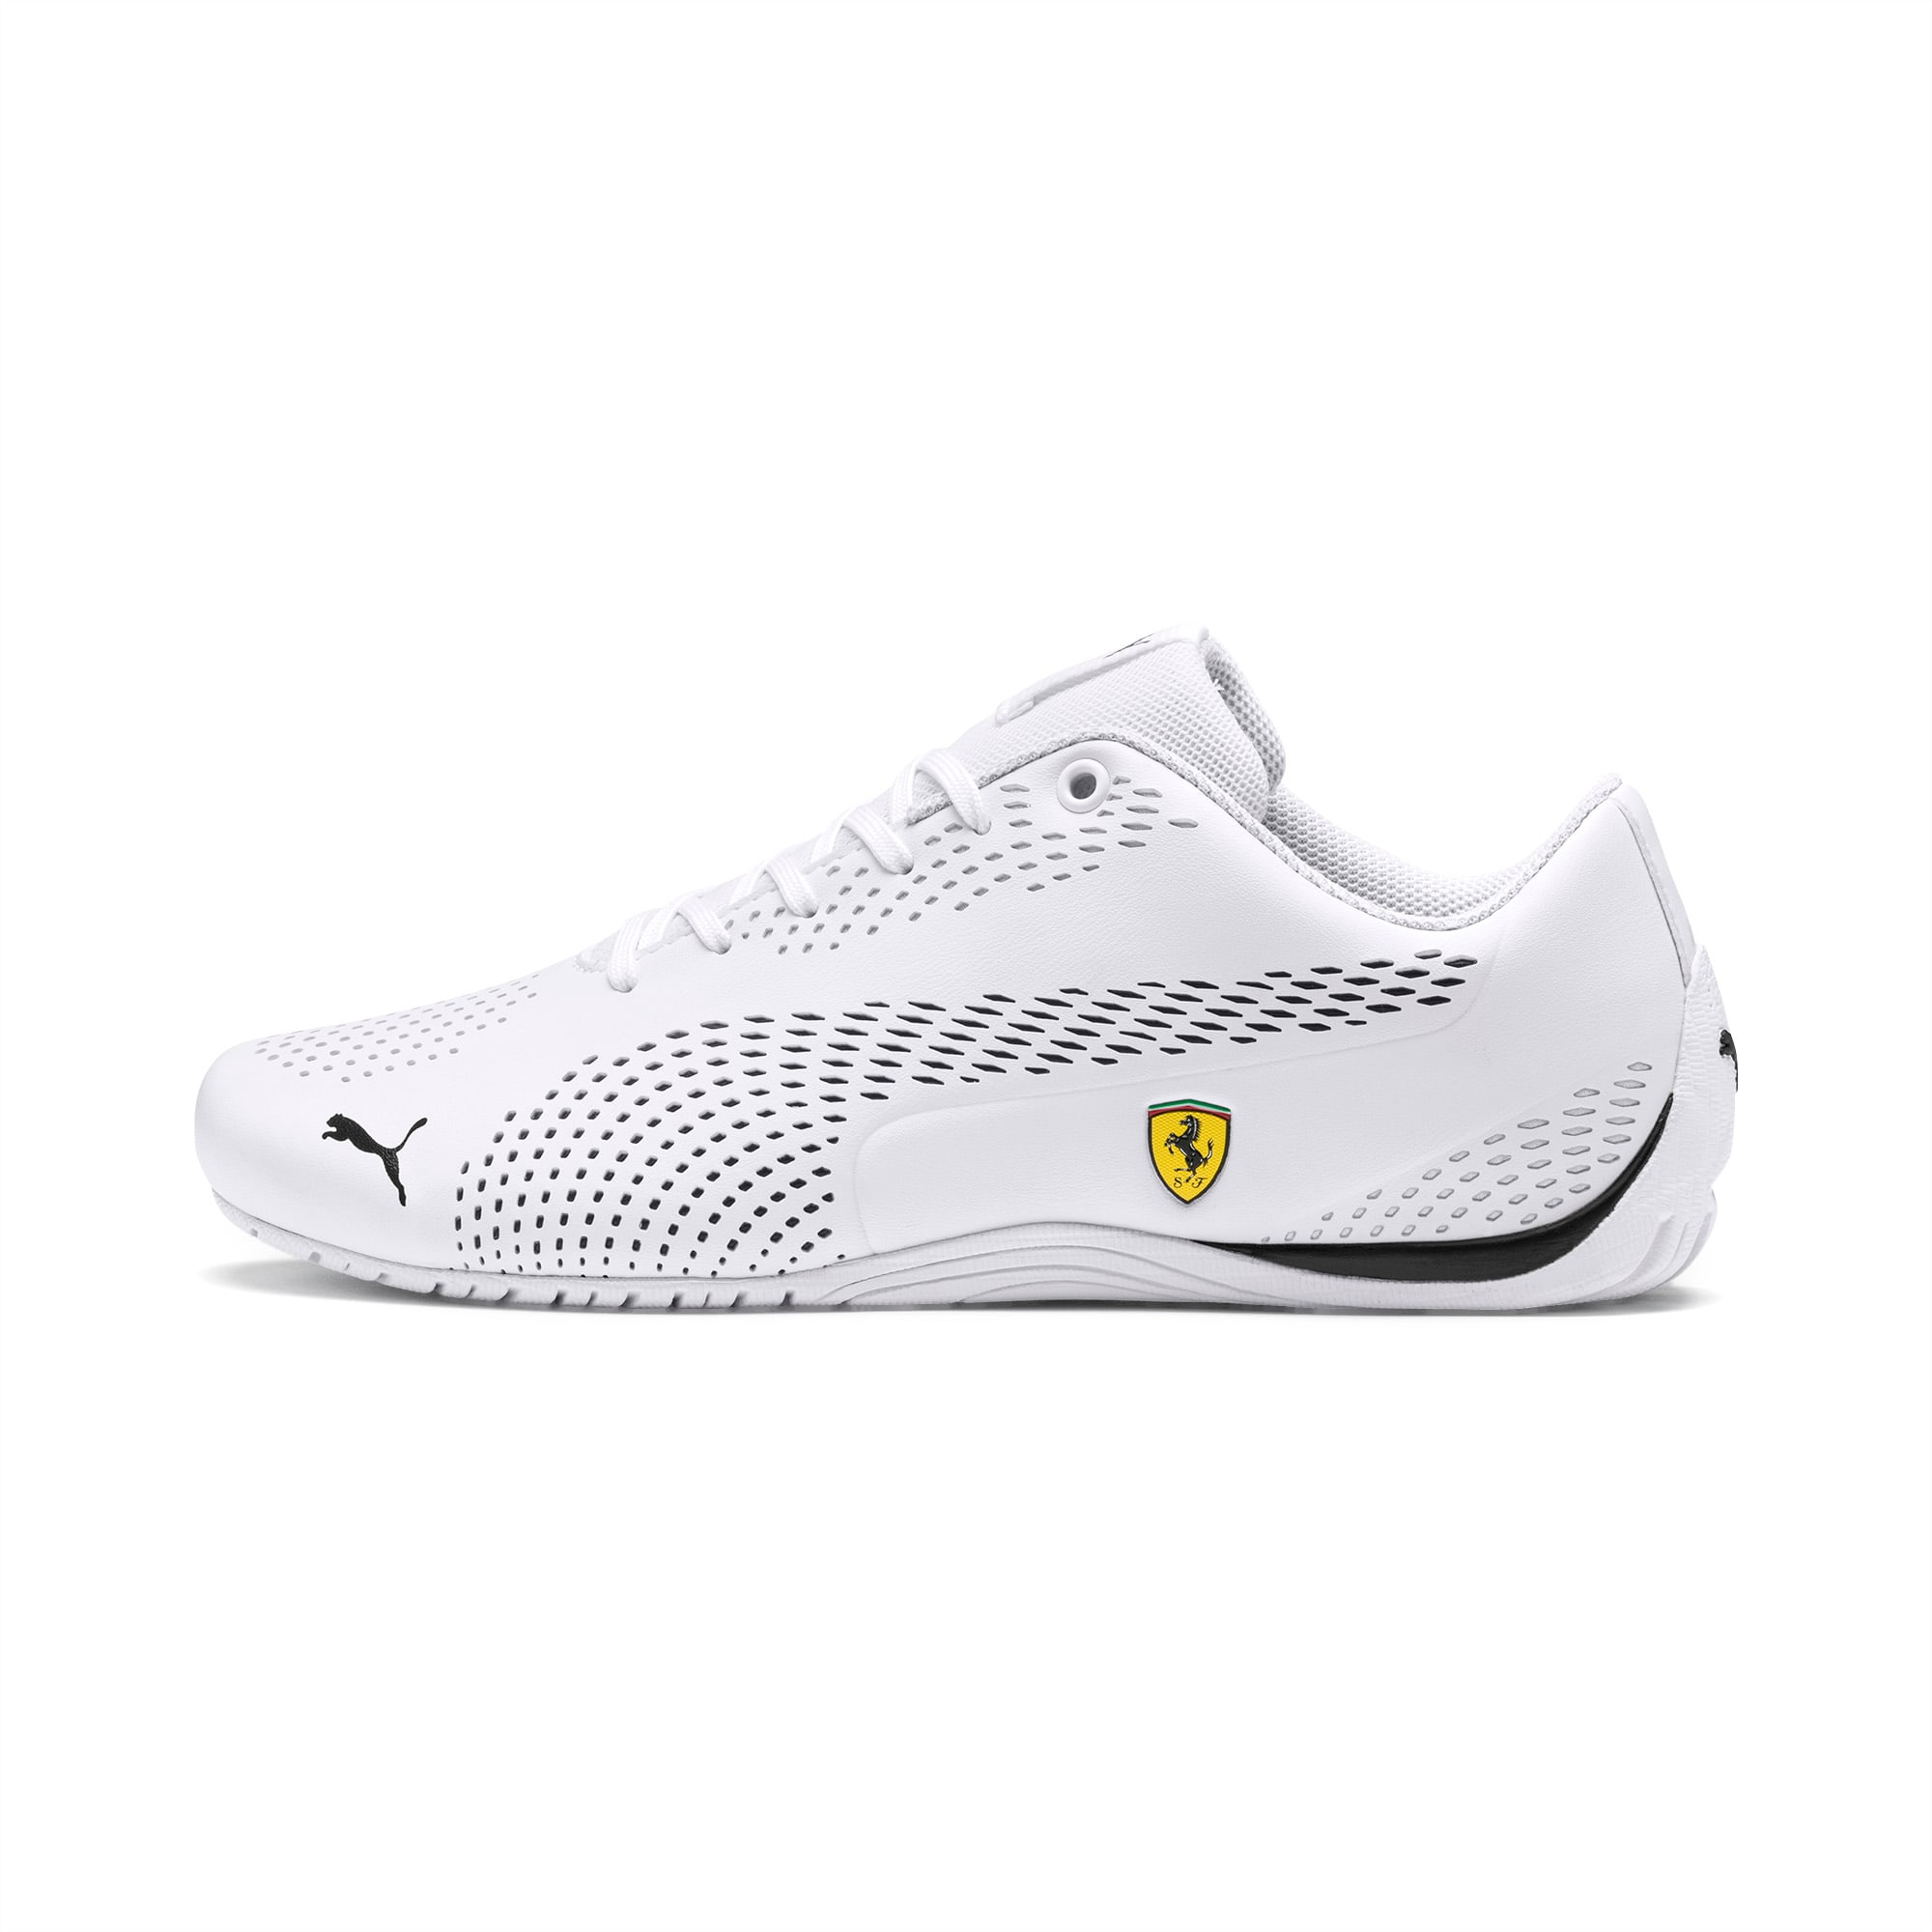 acoso representante postre  Scuderia Ferrari Drift Cat 5 Ultra II Shoes | PUMA US